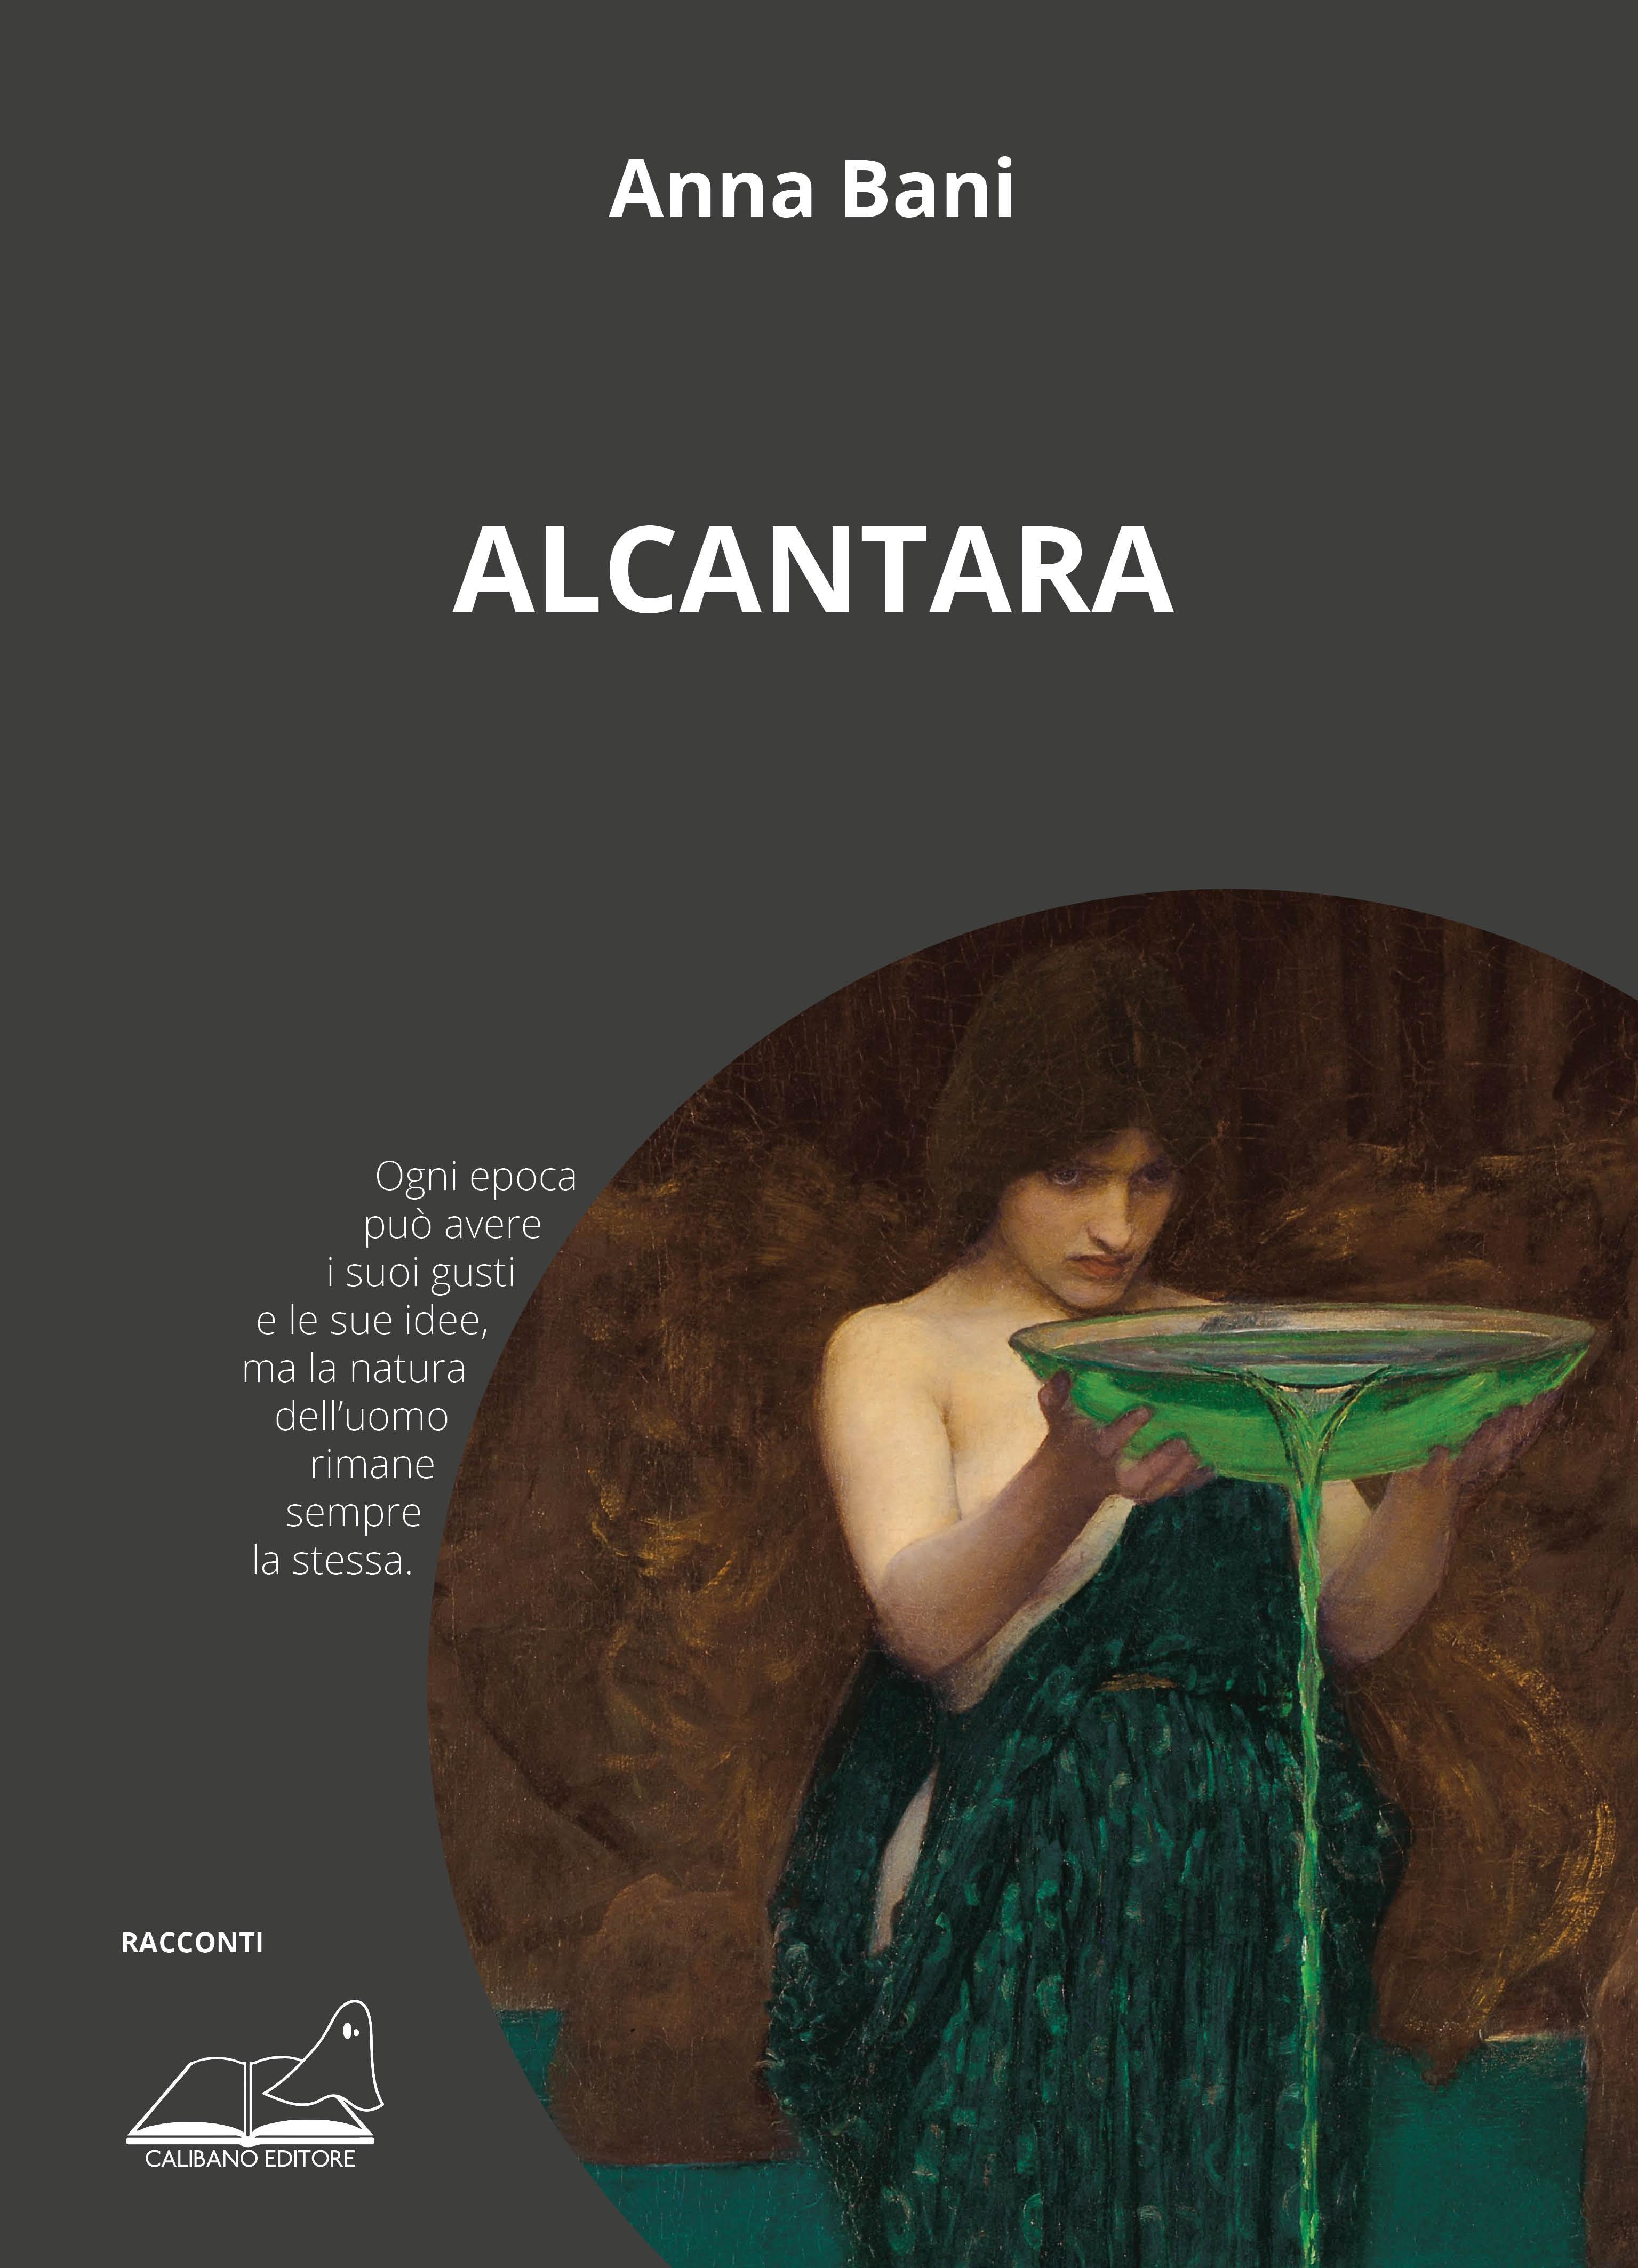 Alcantara-image-1%>